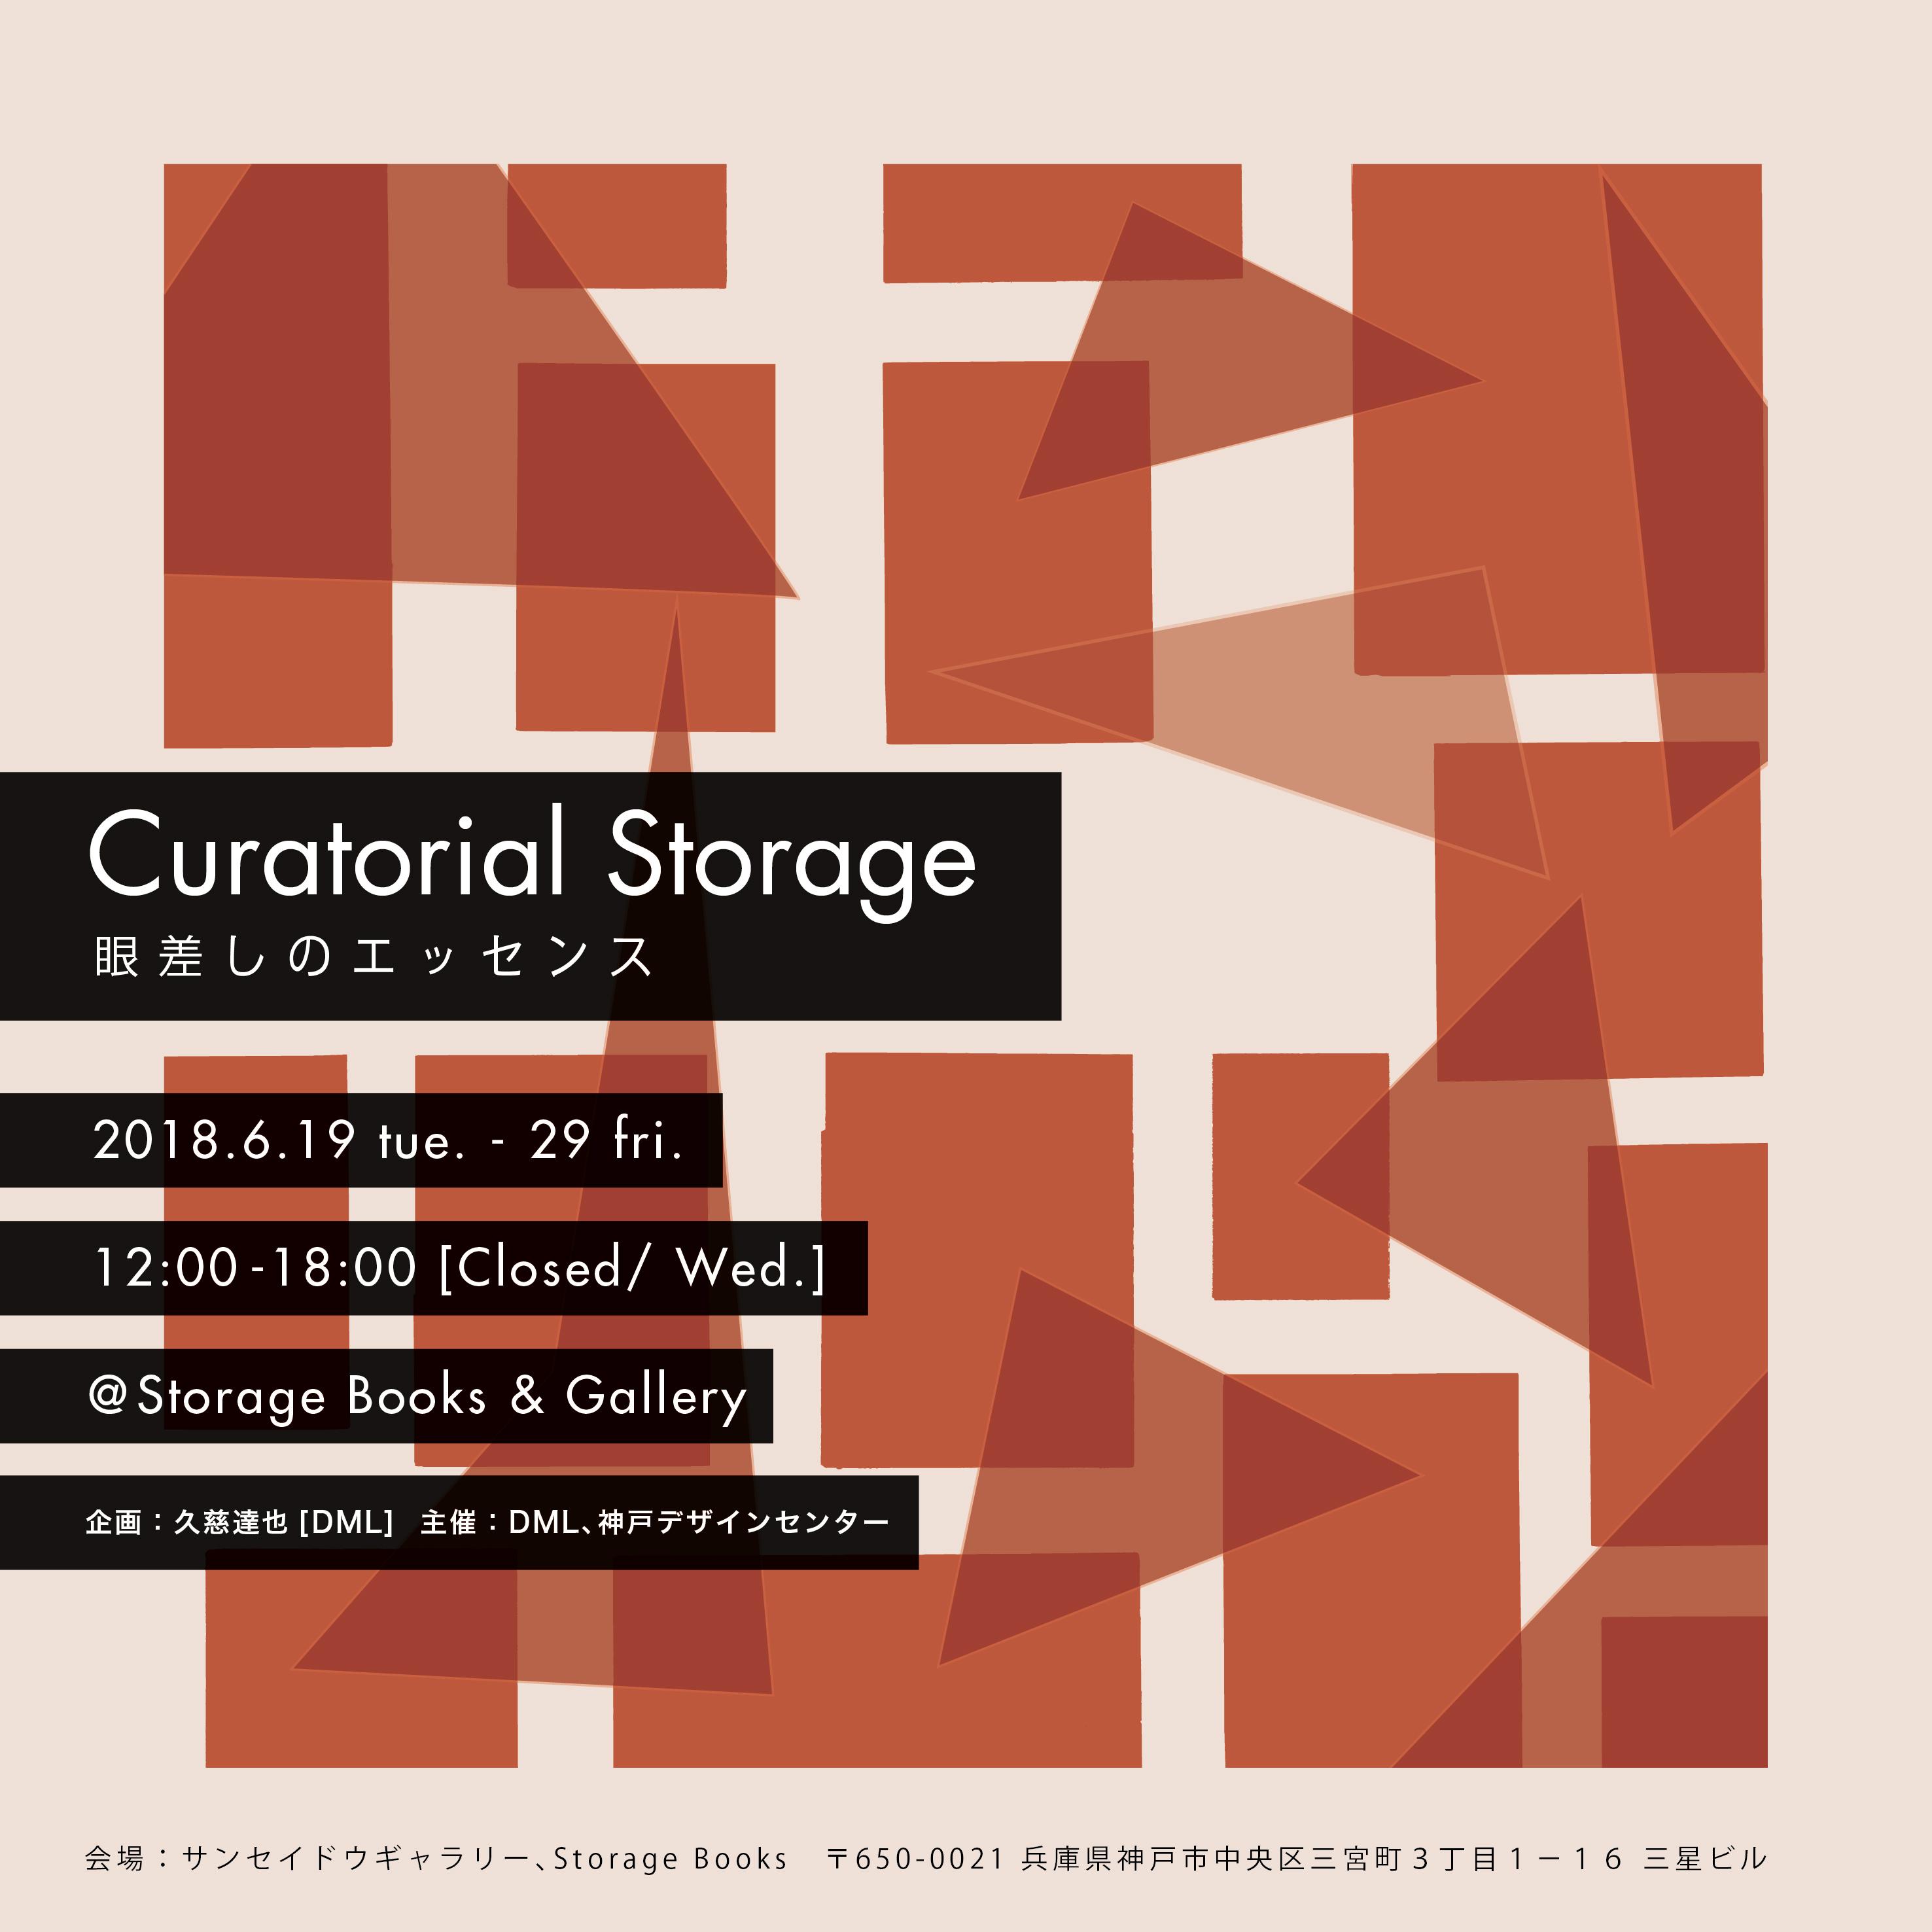 Curatorial Storage -眼差しのエッセンス-